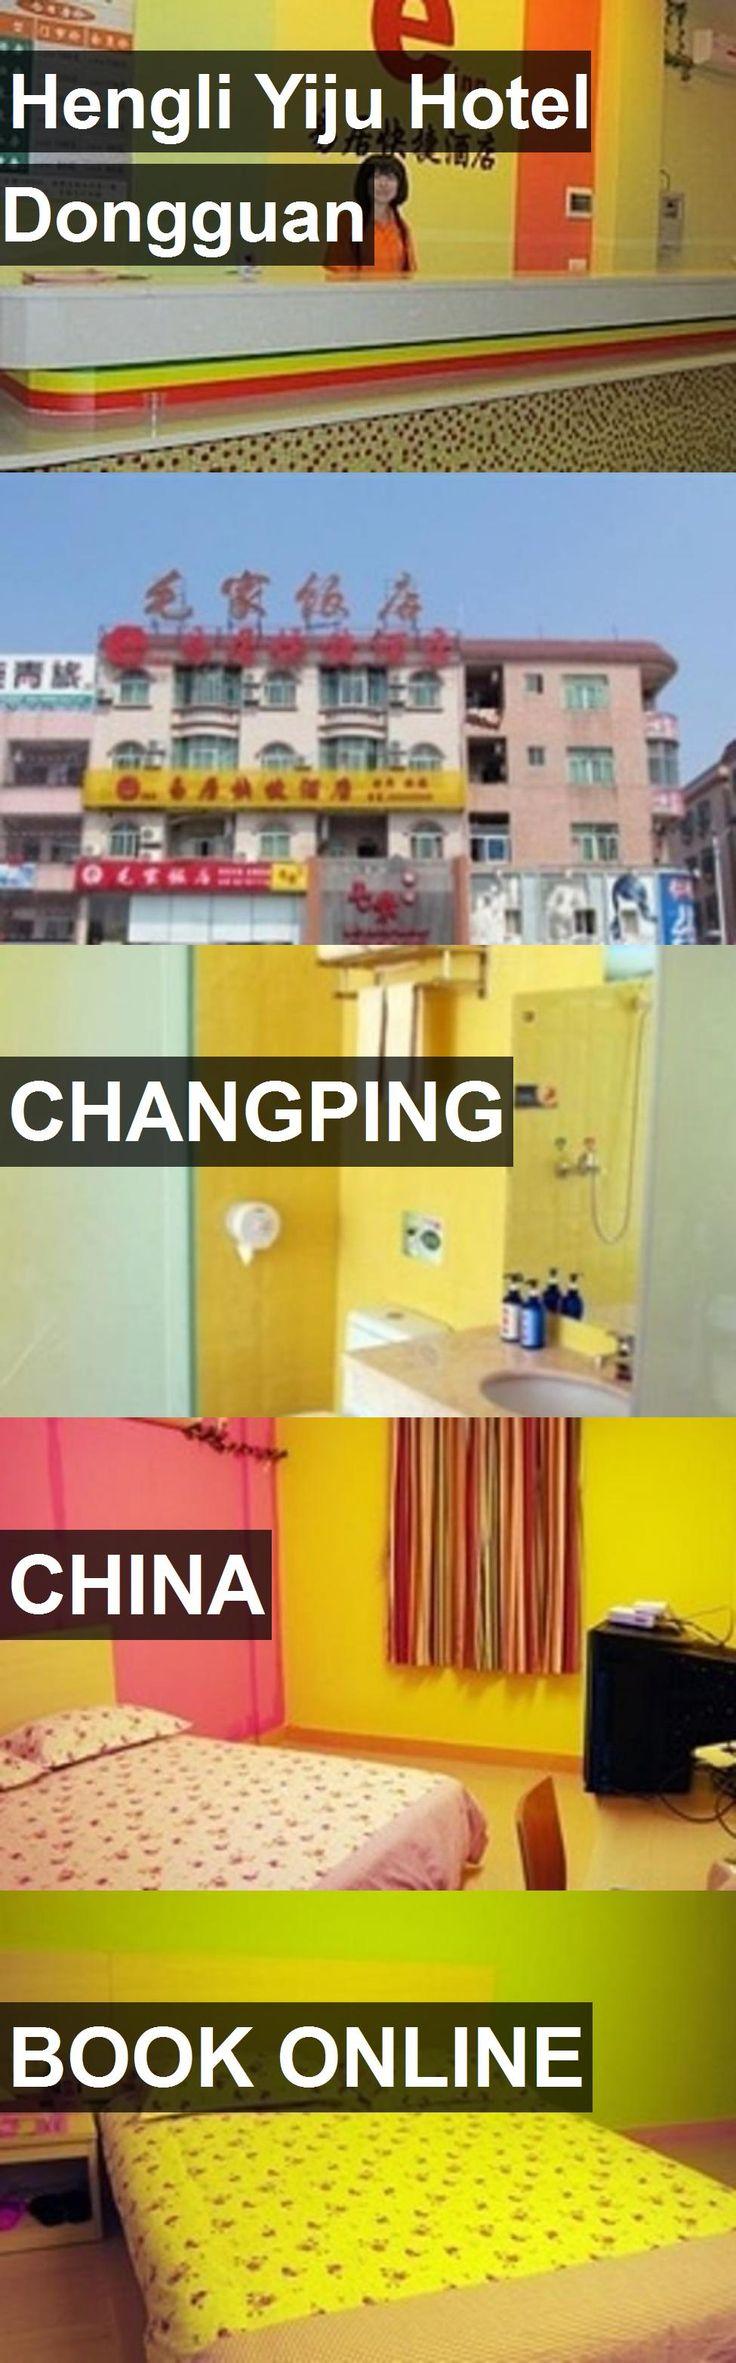 Hotel Hengli Yiju Hotel Dongguan in Changping, China. For more information, photos, reviews and best prices please follow the link. #China #Changping #HengliYijuHotelDongguan #hotel #travel #vacation